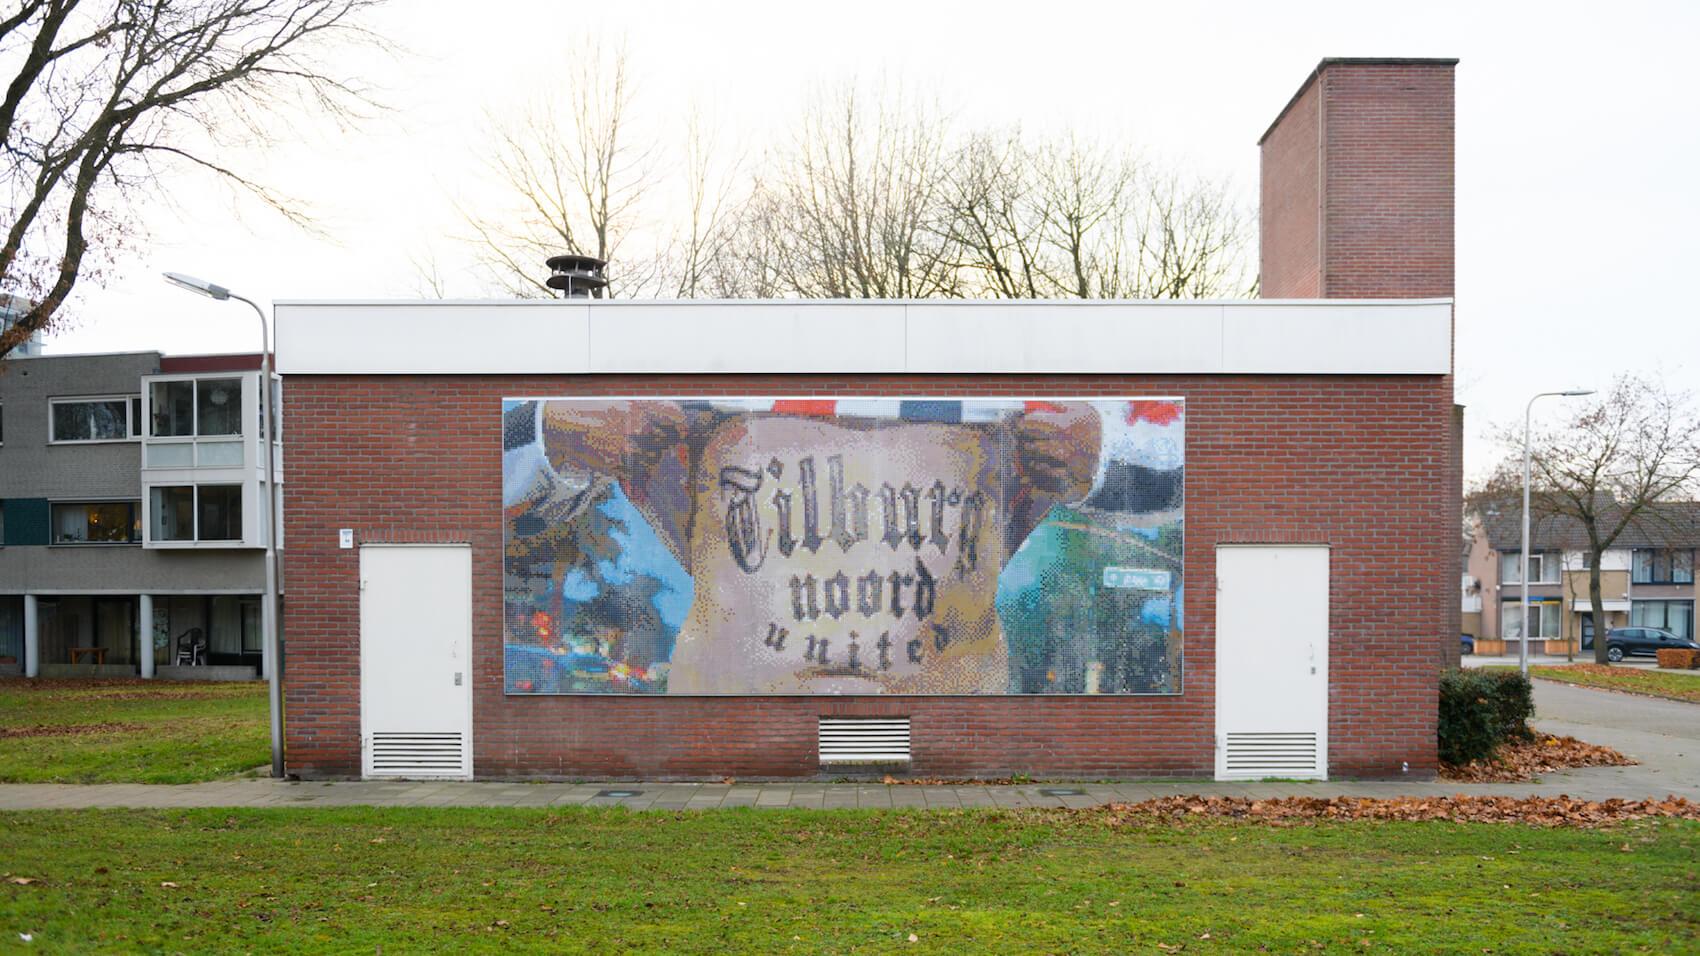 Tilburg Noord United